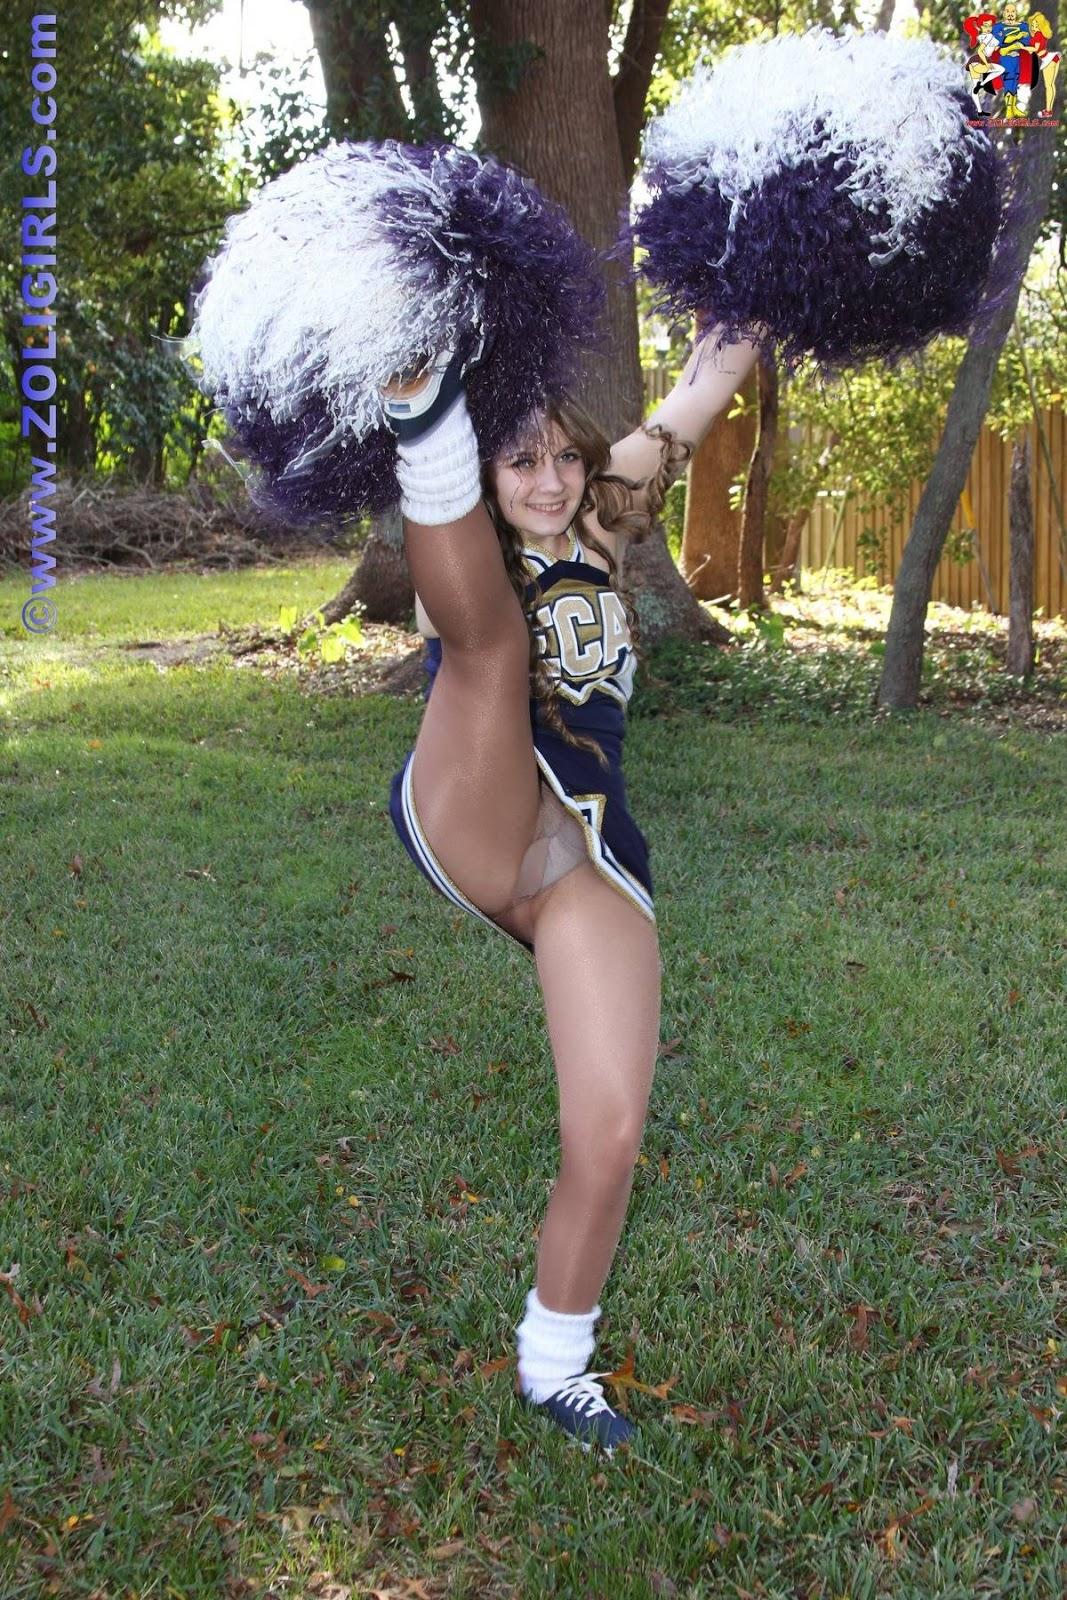 Pantyhose schoolgirl uniform sex